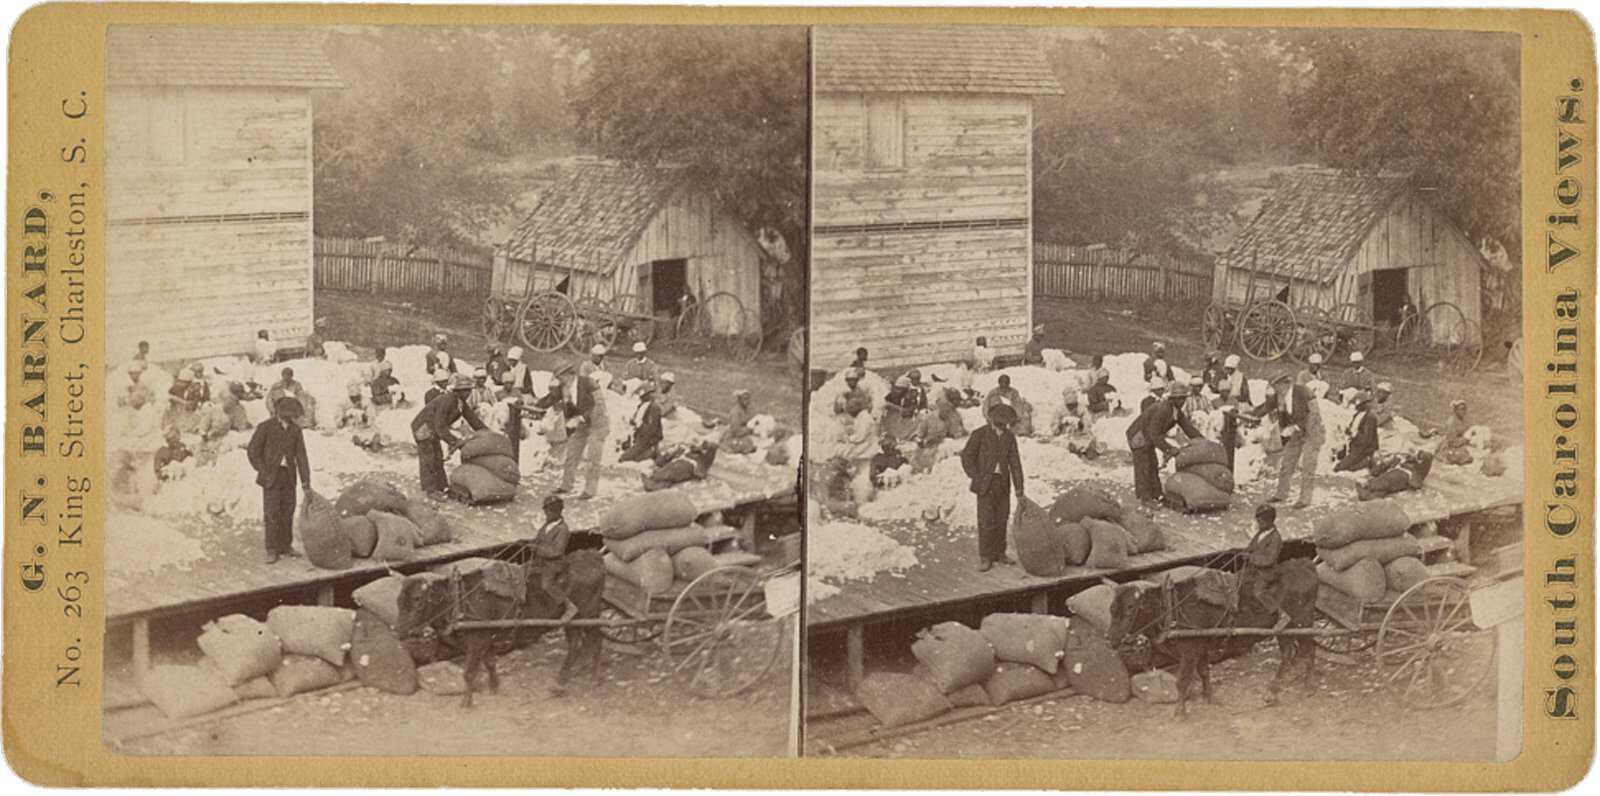 Reconstruction-S-violence-LOC-1874.jpg